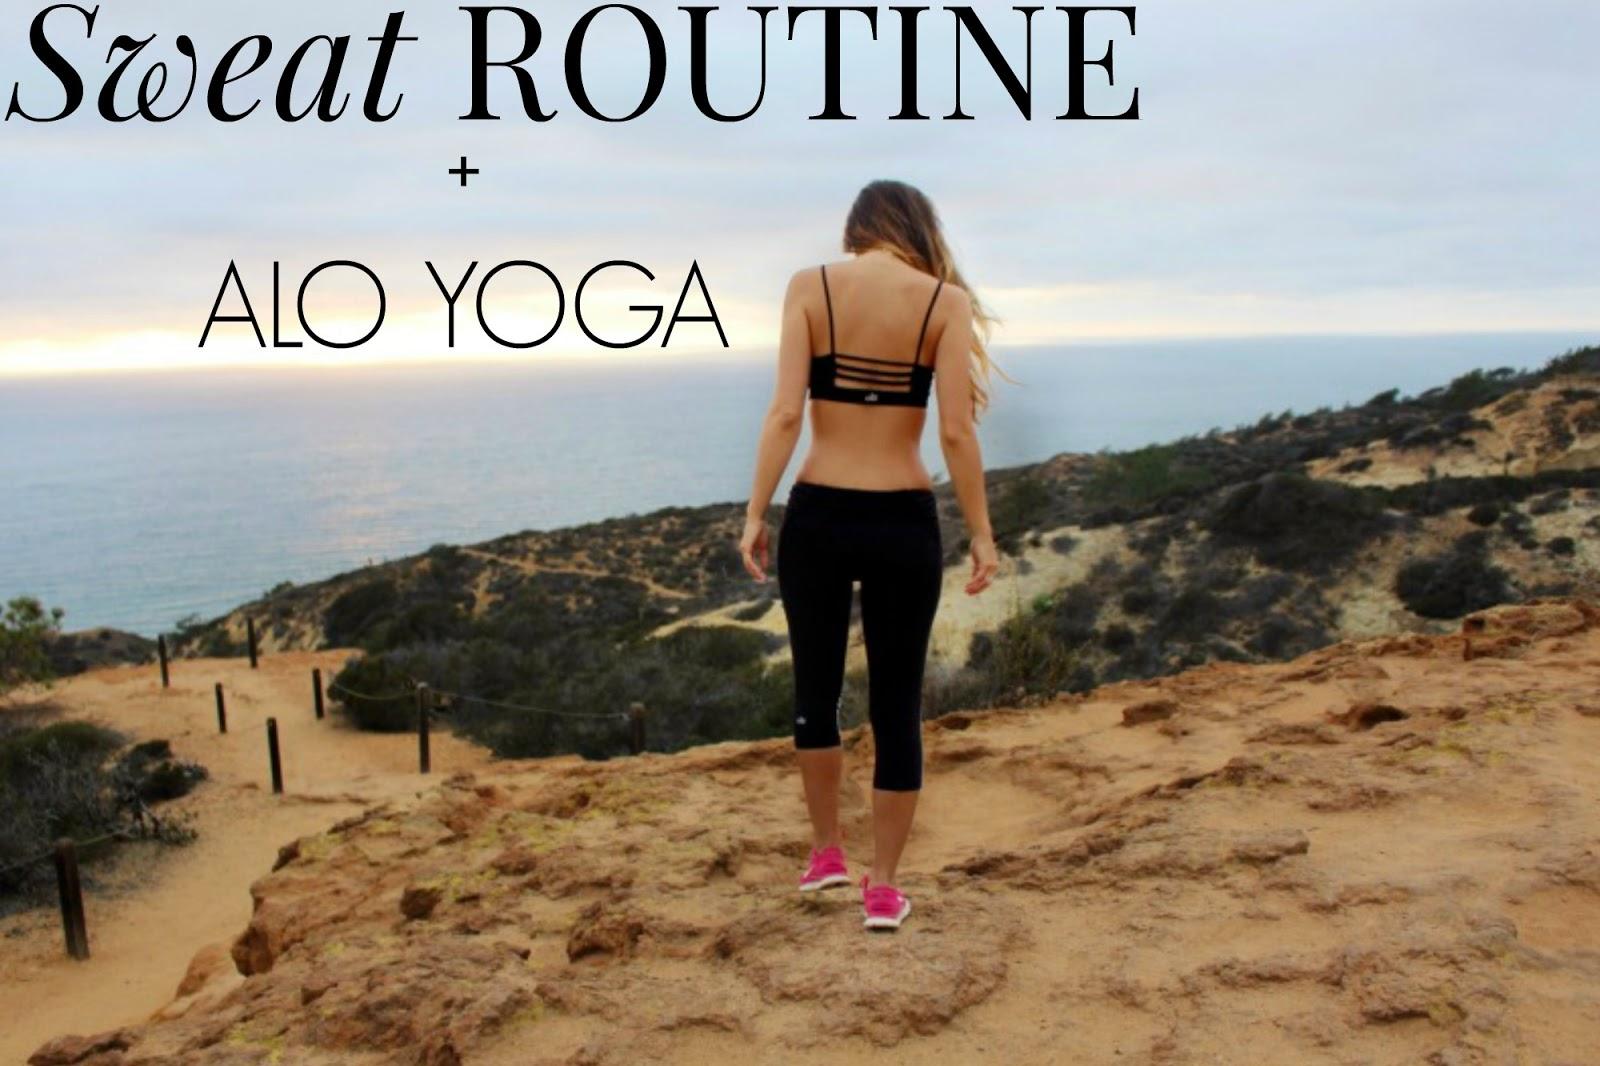 http://www.mepoopsie.com/2014/08/sweat-routine-alo-yoga.html